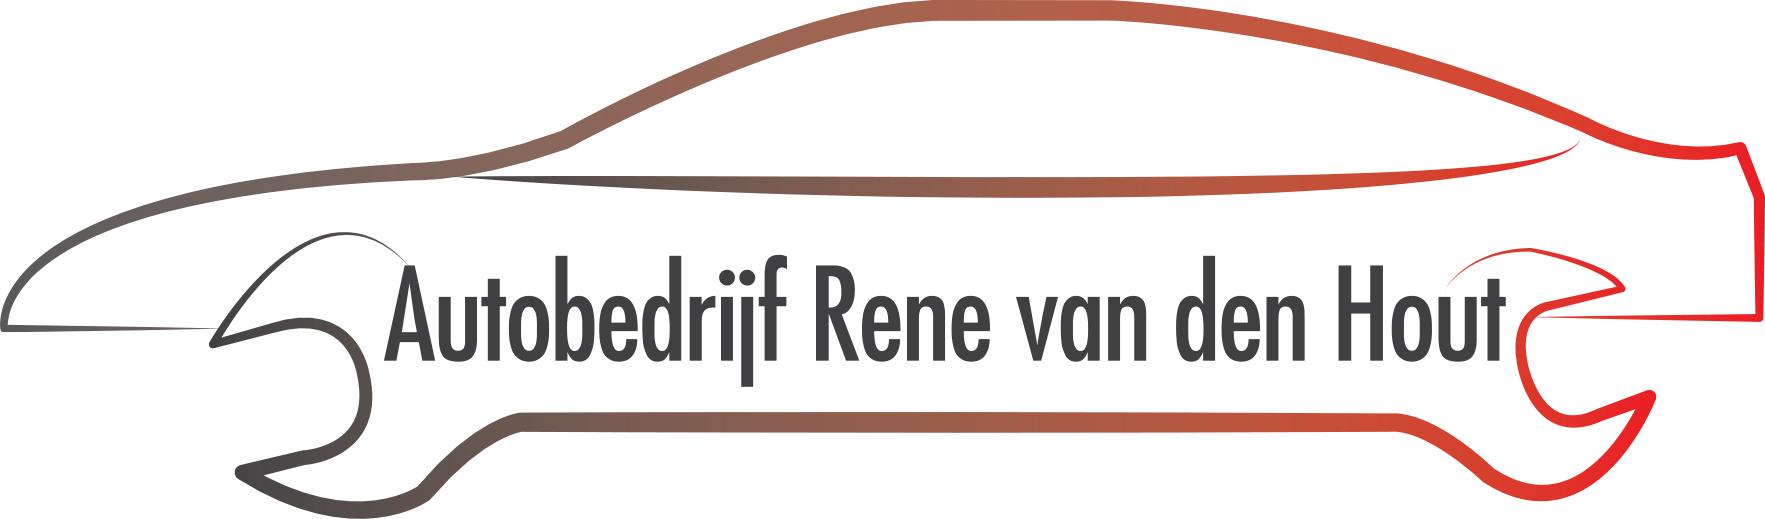 autobedrijf-rene-van-den-hout--fd35e40a58fa88ea5e3605d12e6bea84.jpg